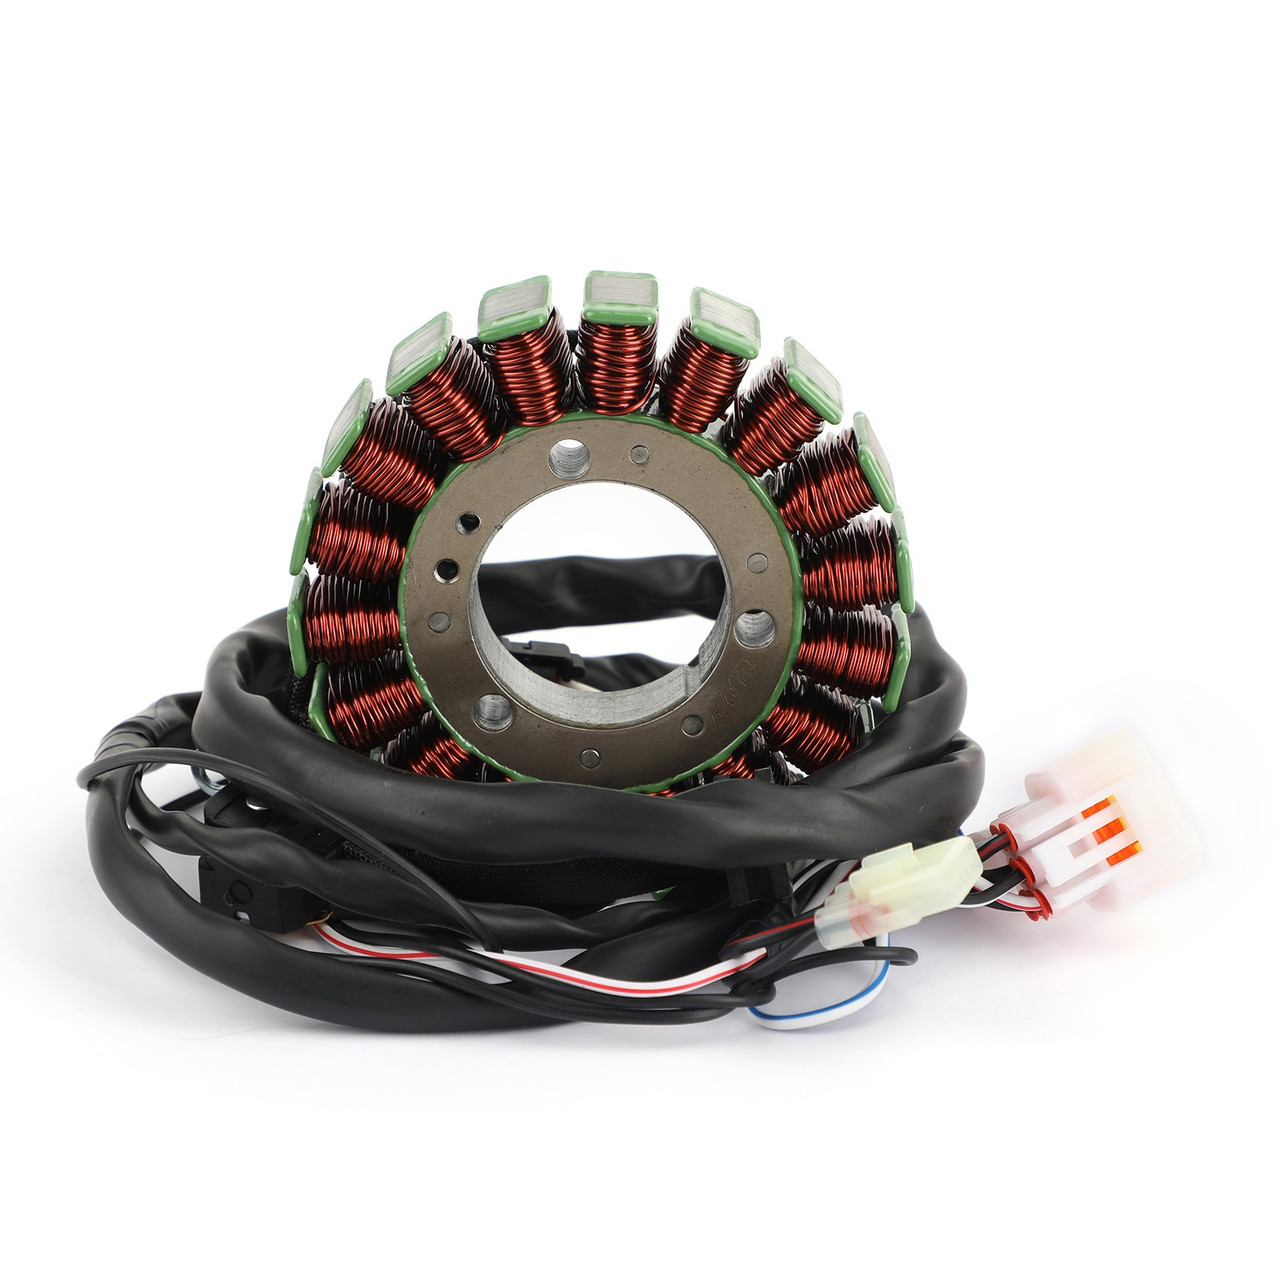 Magneto Generator Engine Stator Fit For Polaris Hawkeye 300 / Sportsman 300 06-11